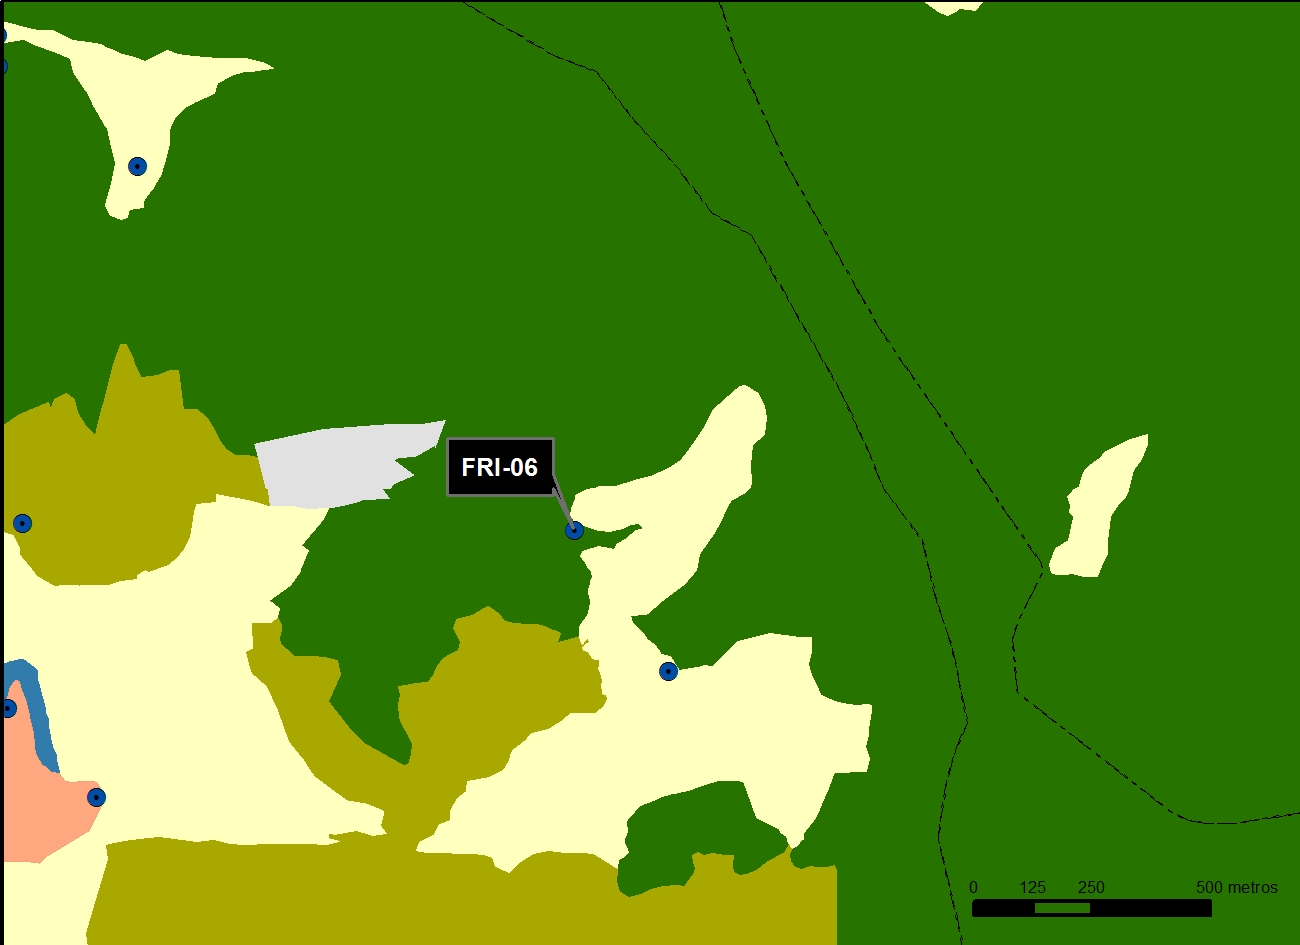 FRI_06_M.V.LOZANO_VALDEVALERO_MAP.VEG